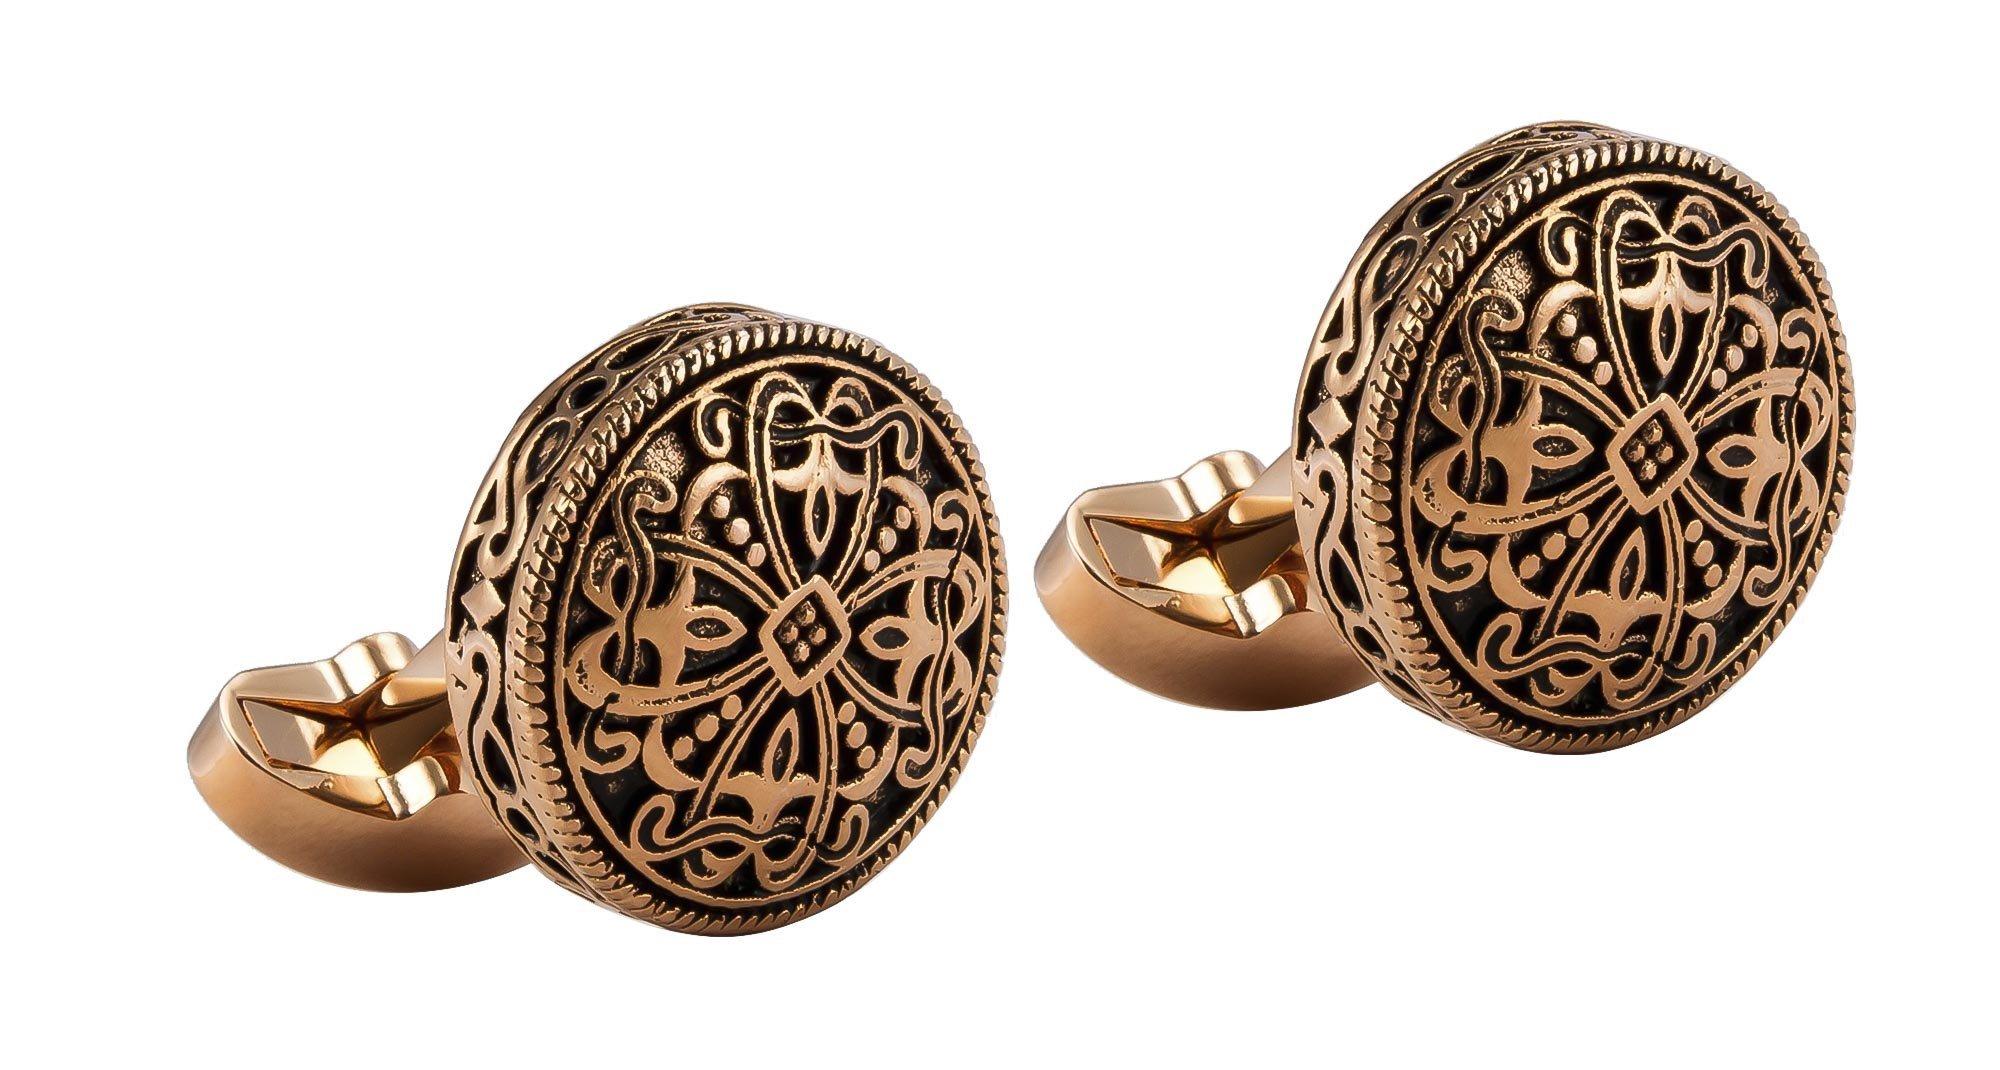 Knighthood Men's Rose Gold Engraving Vintage Cufflinks Gold